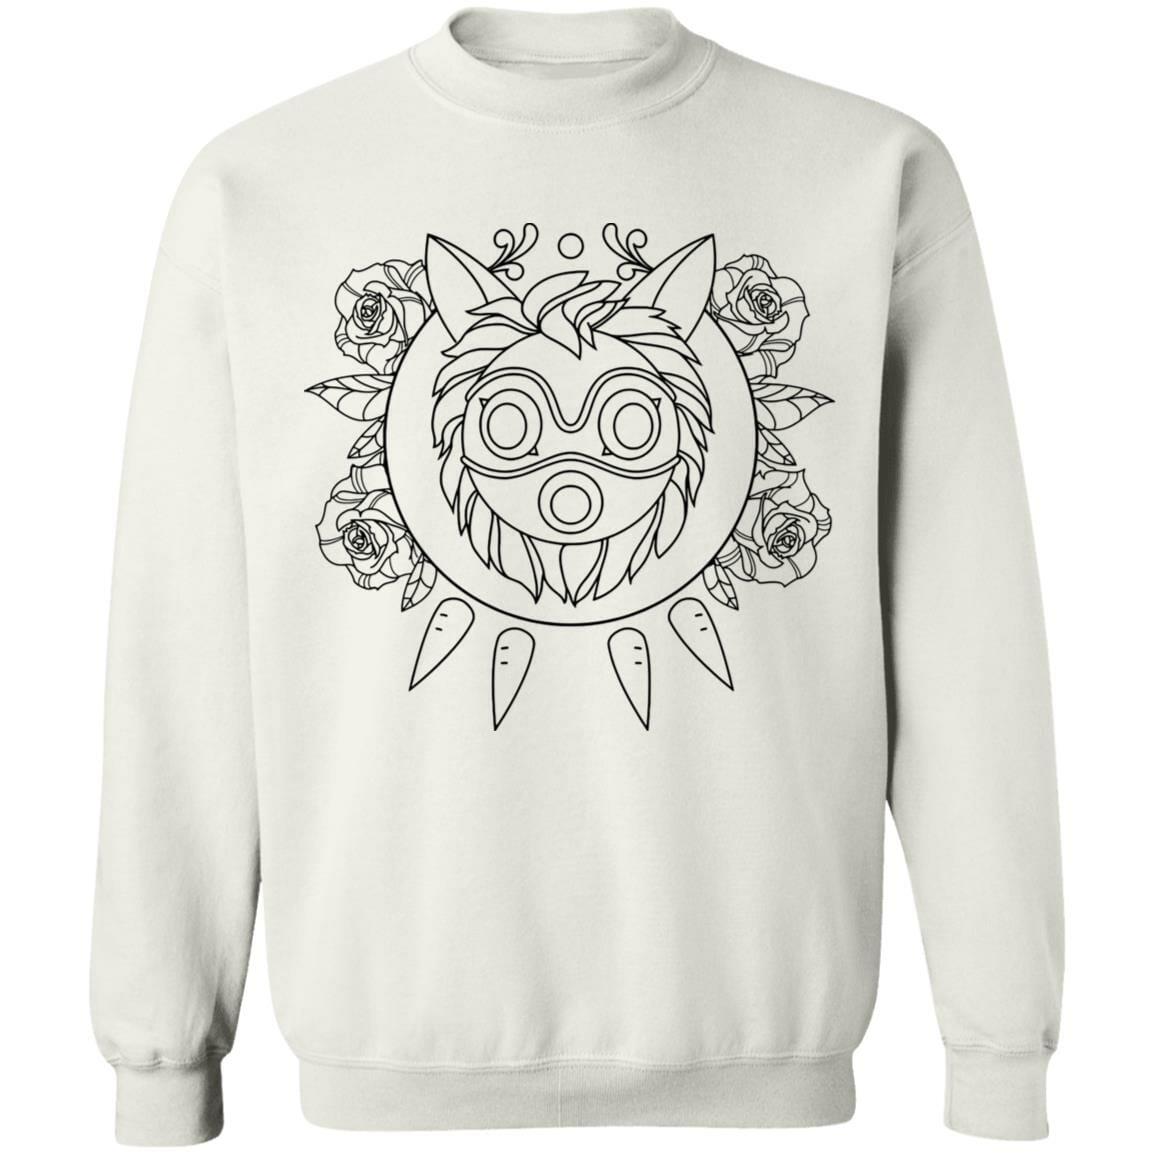 Princess Mononoke Mask in Black and White Sweatshirt Unisex